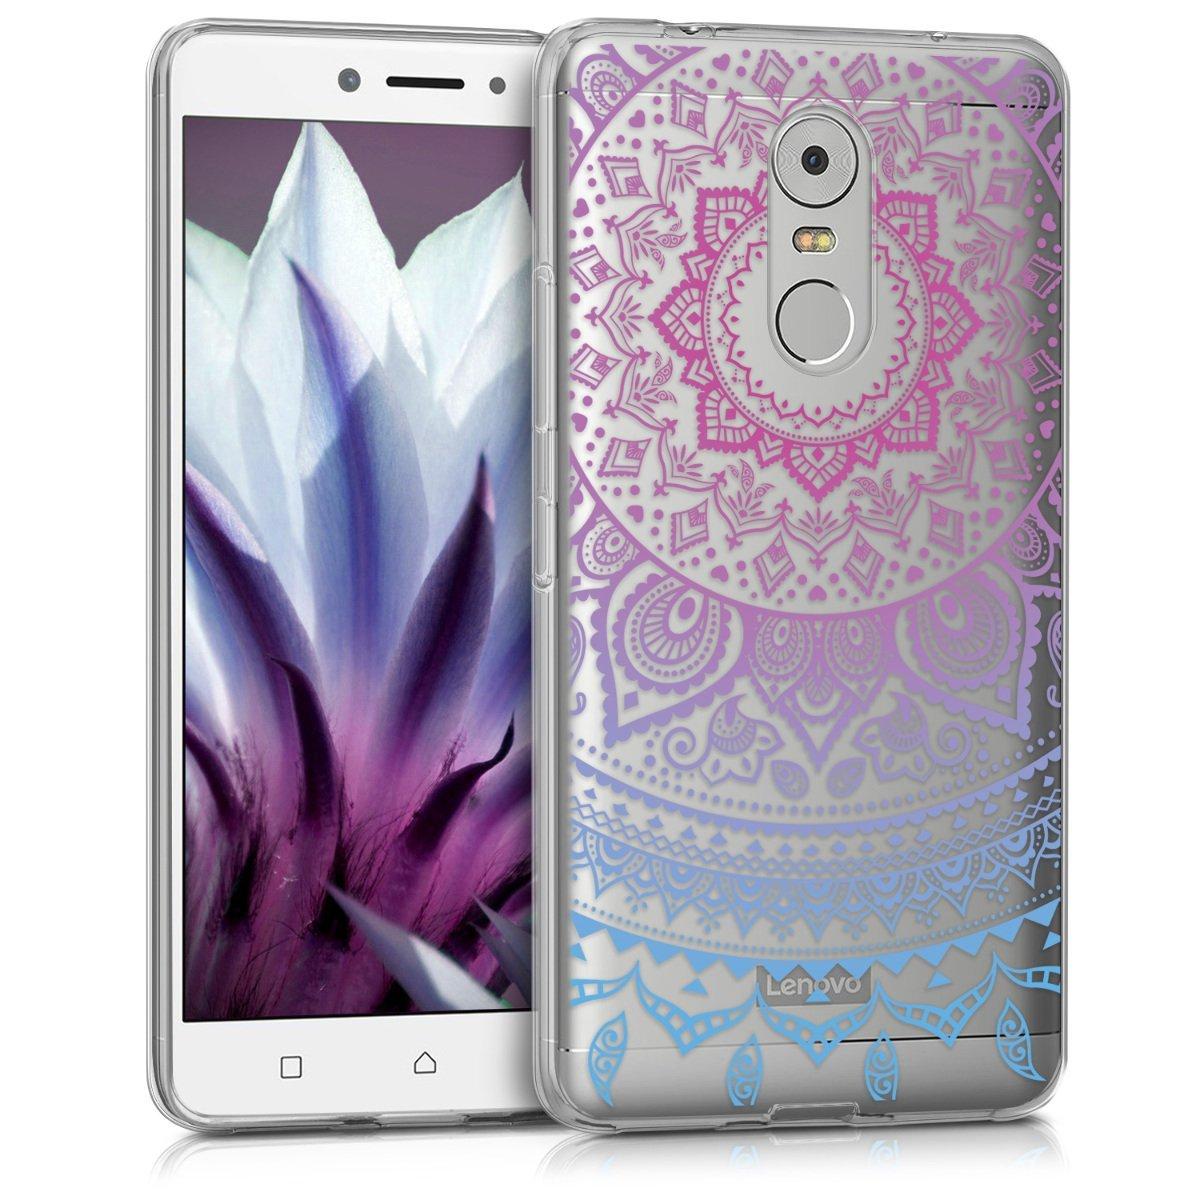 KW Θήκη Σιλικόνης Lenovo K6 Note - Blue Dark/ Pink Indian Sun (40501.01) θήκες κινητών